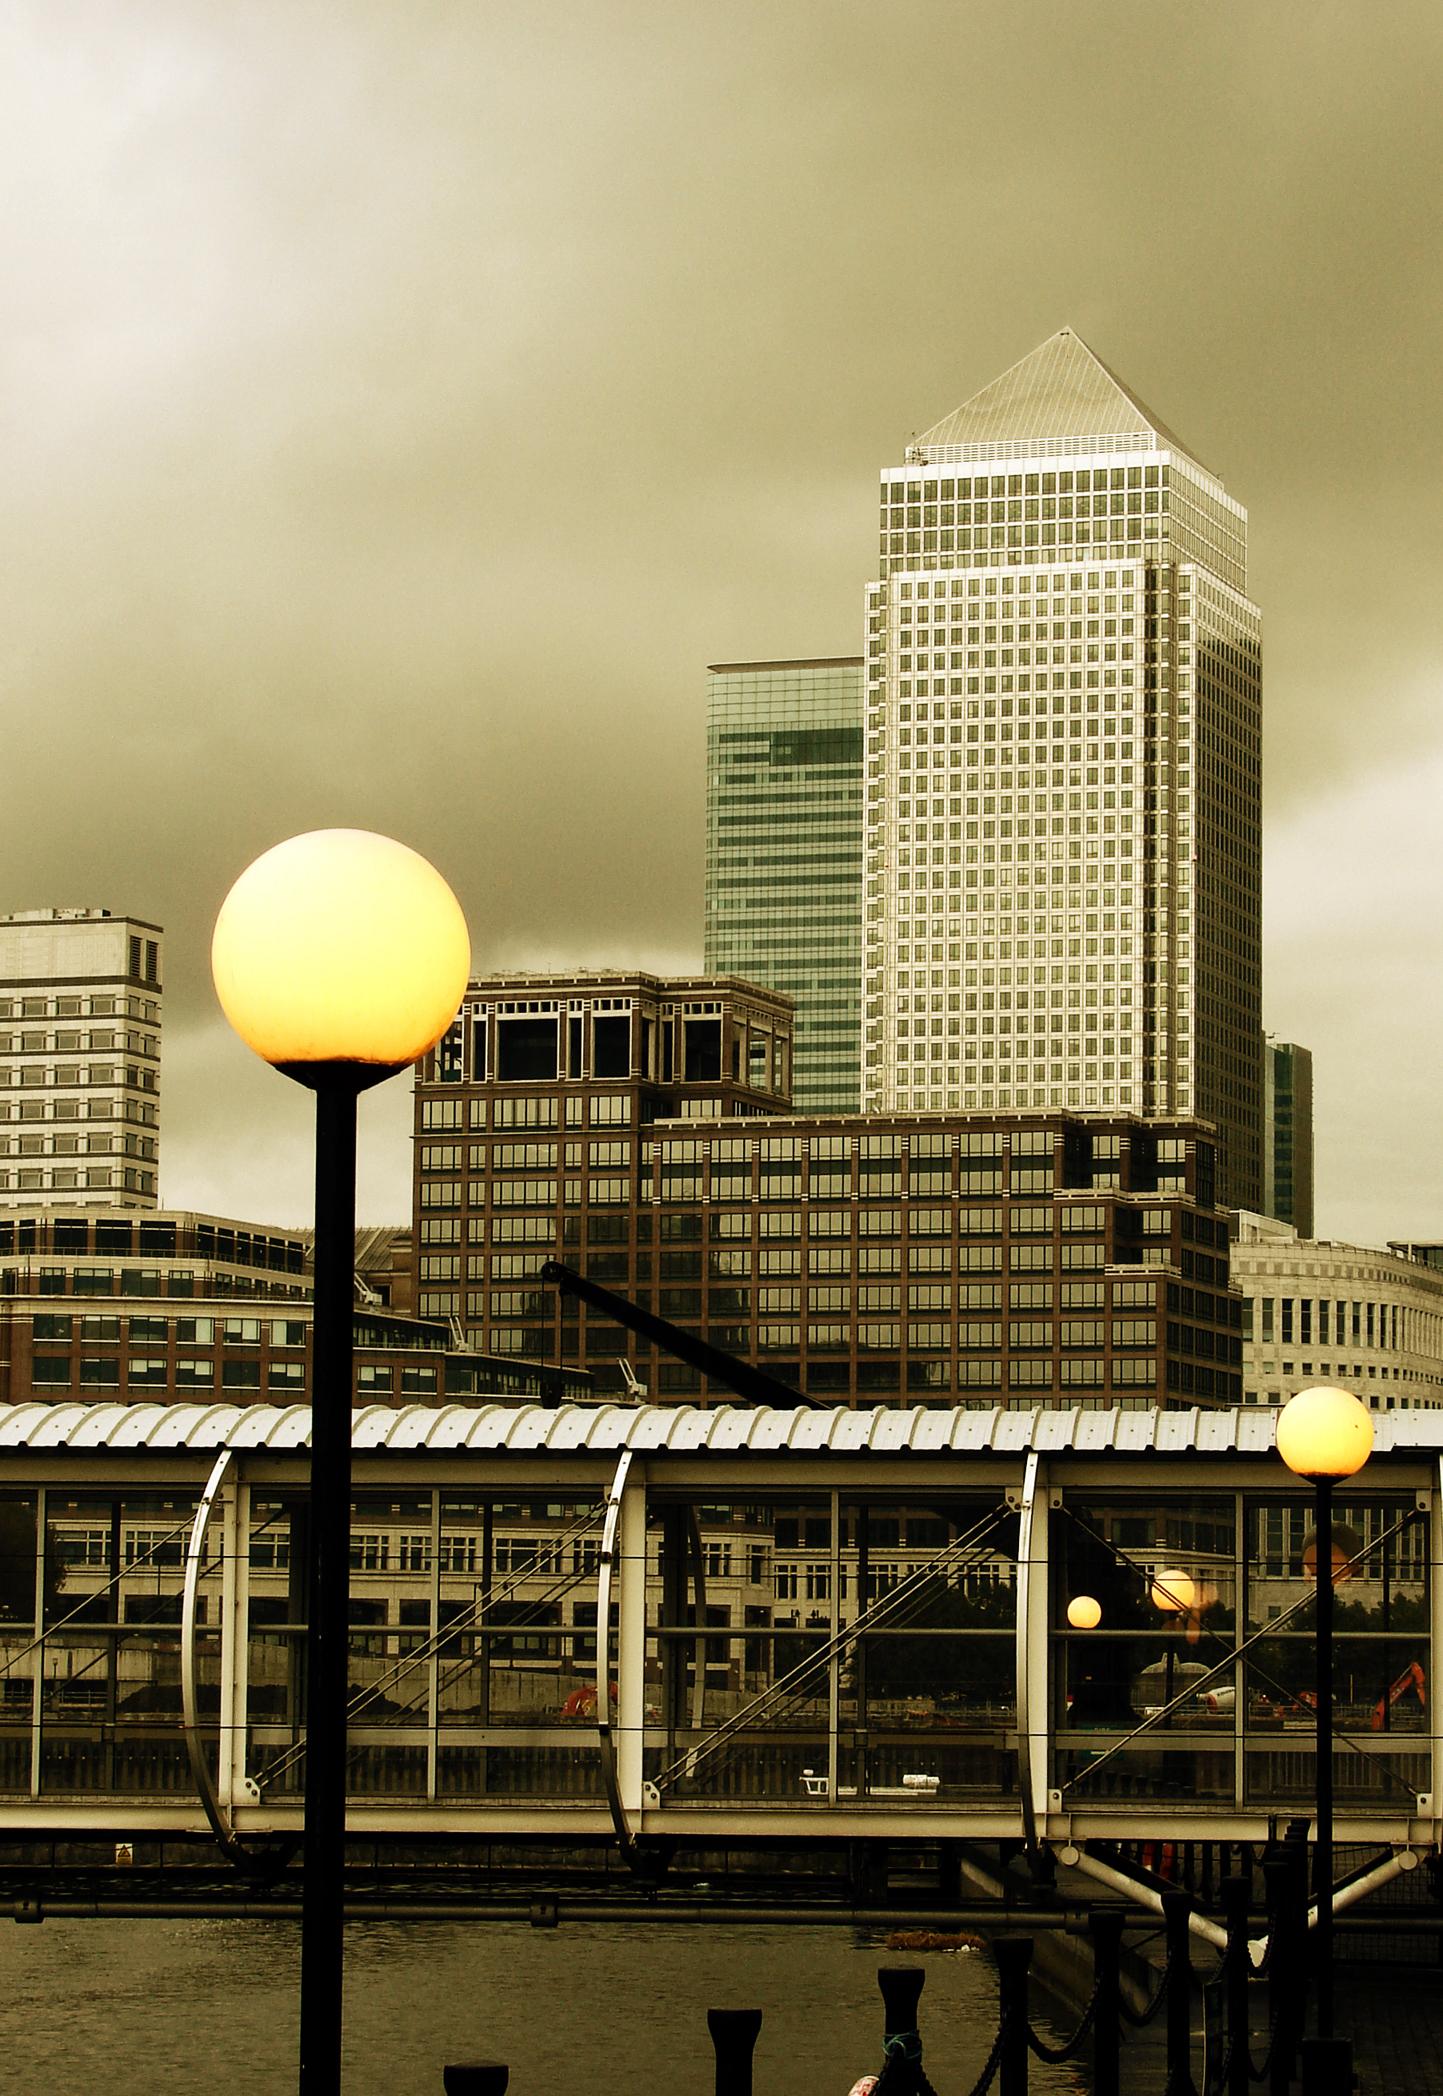 Osborne to launch 20 enterprise zones